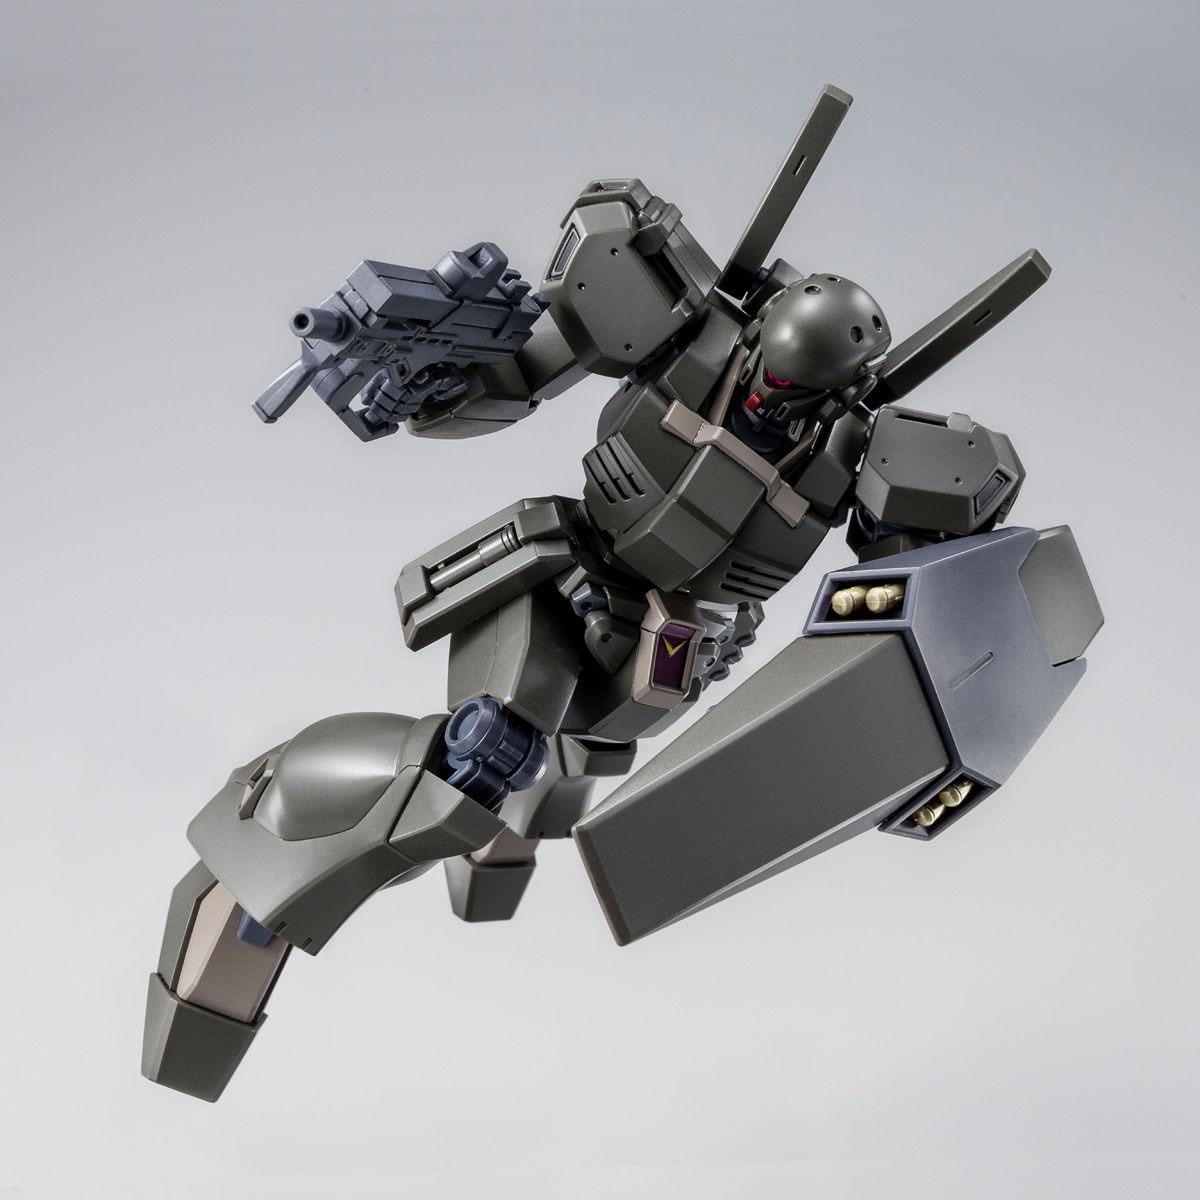 HG 1/144『ジェガンD型 (護衛隊仕様)』機動戦士ガンダムNT プラモデル-004